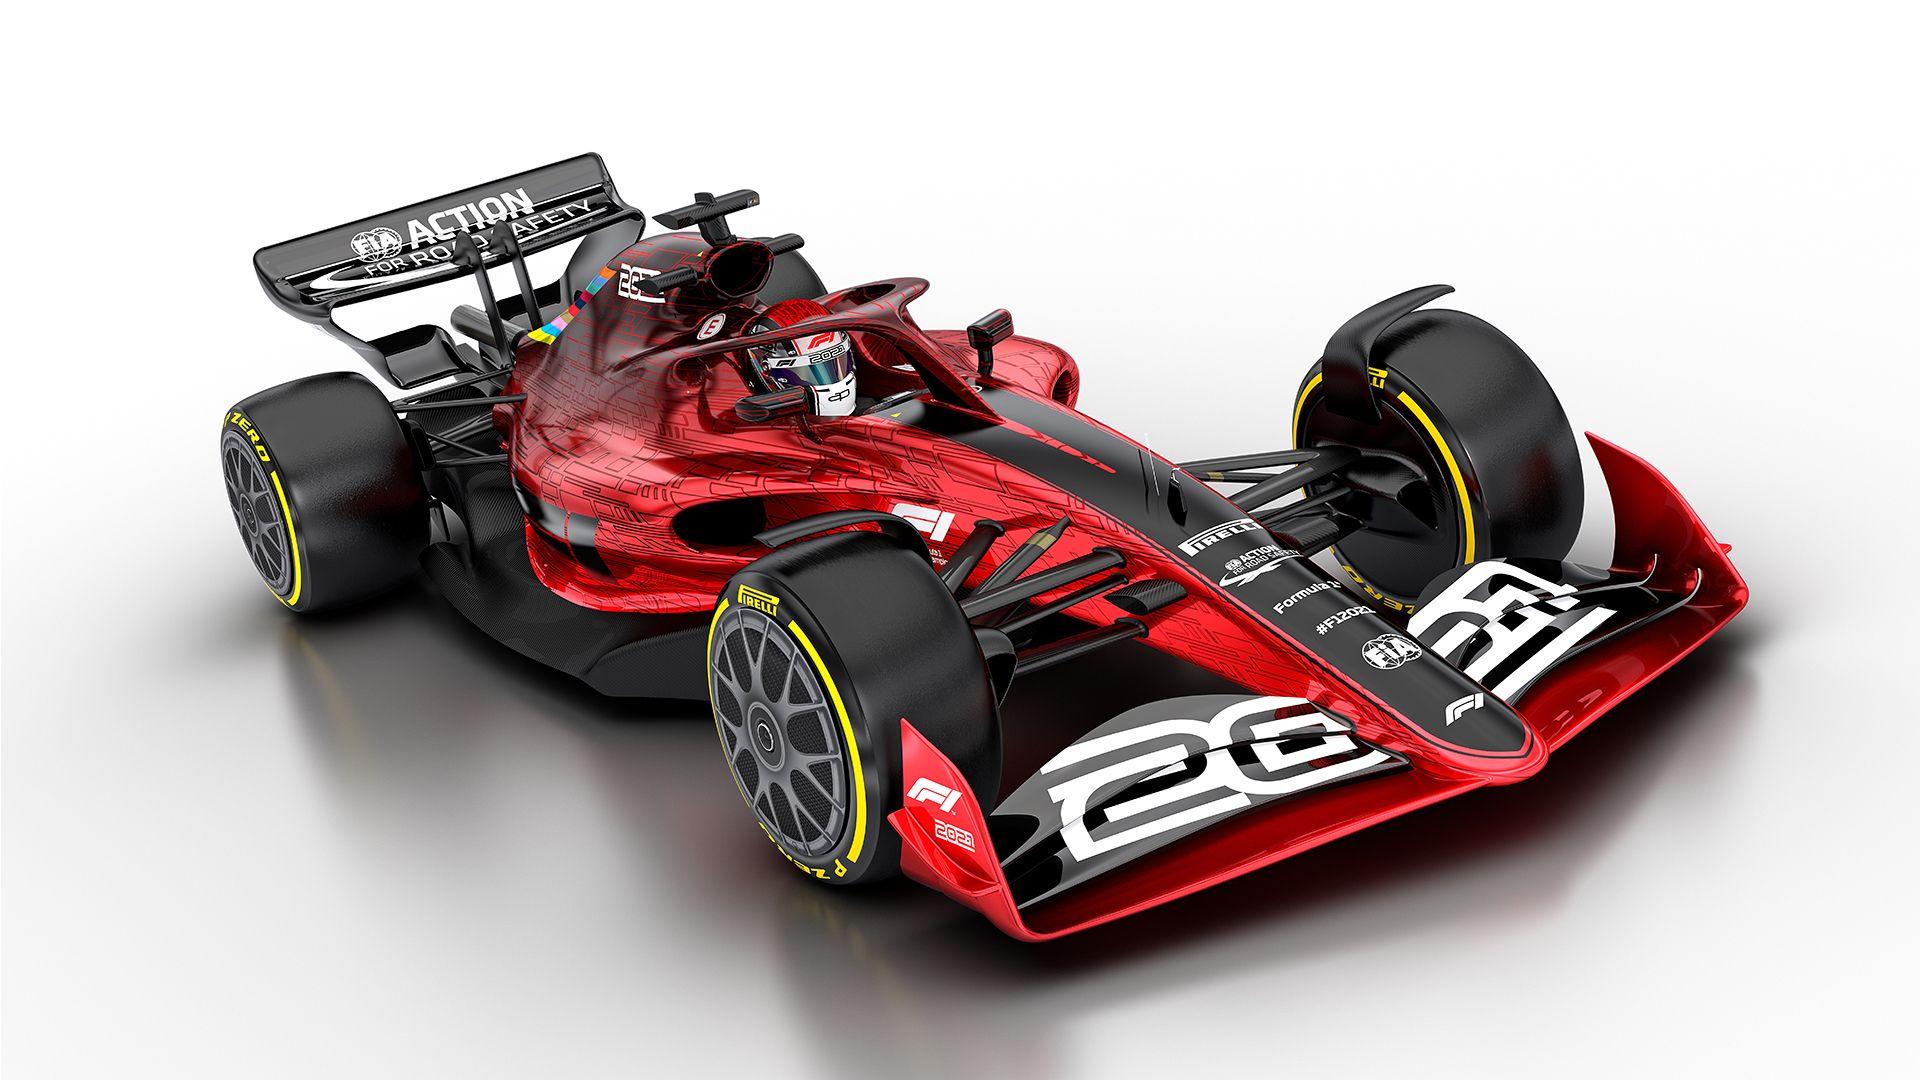 F1 2020 Wallpapers Wallpaper Cave